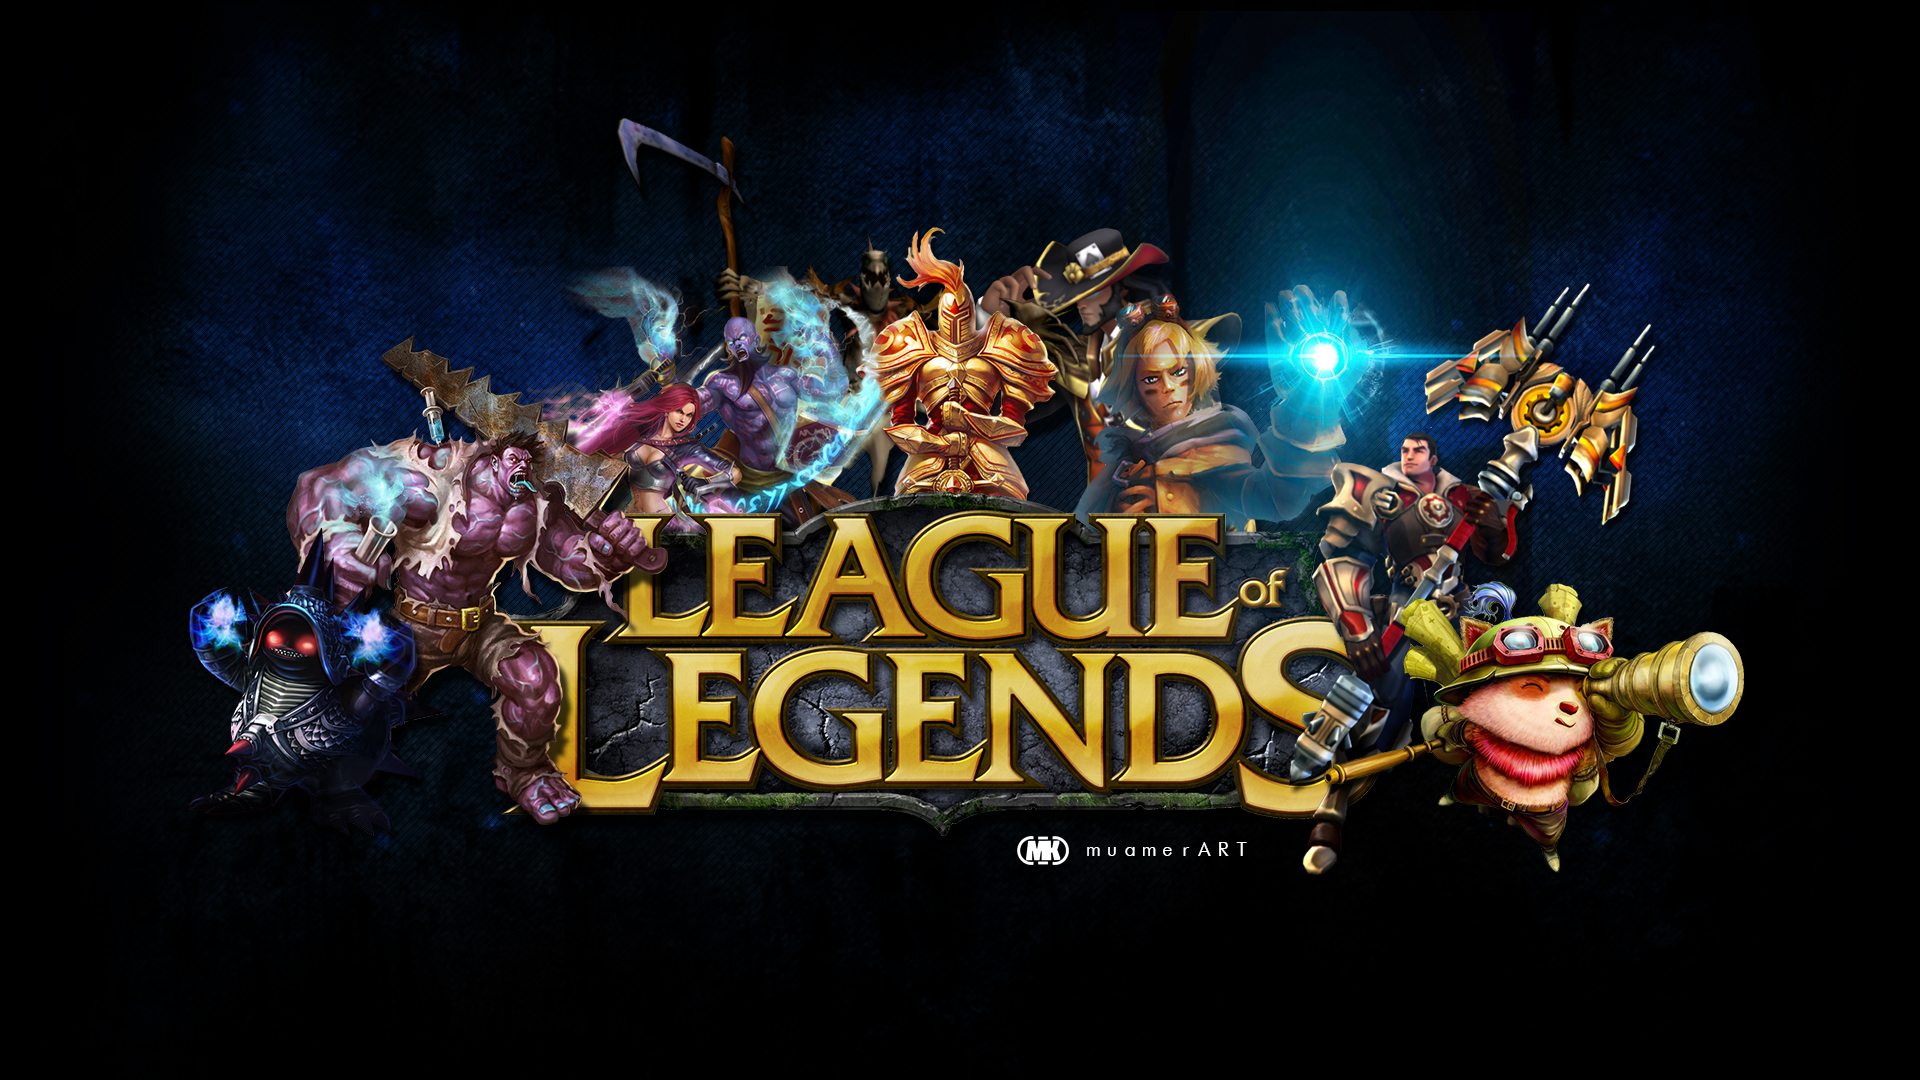 League Of Legends Wallpaper Hd By Muamerart On Deviantart